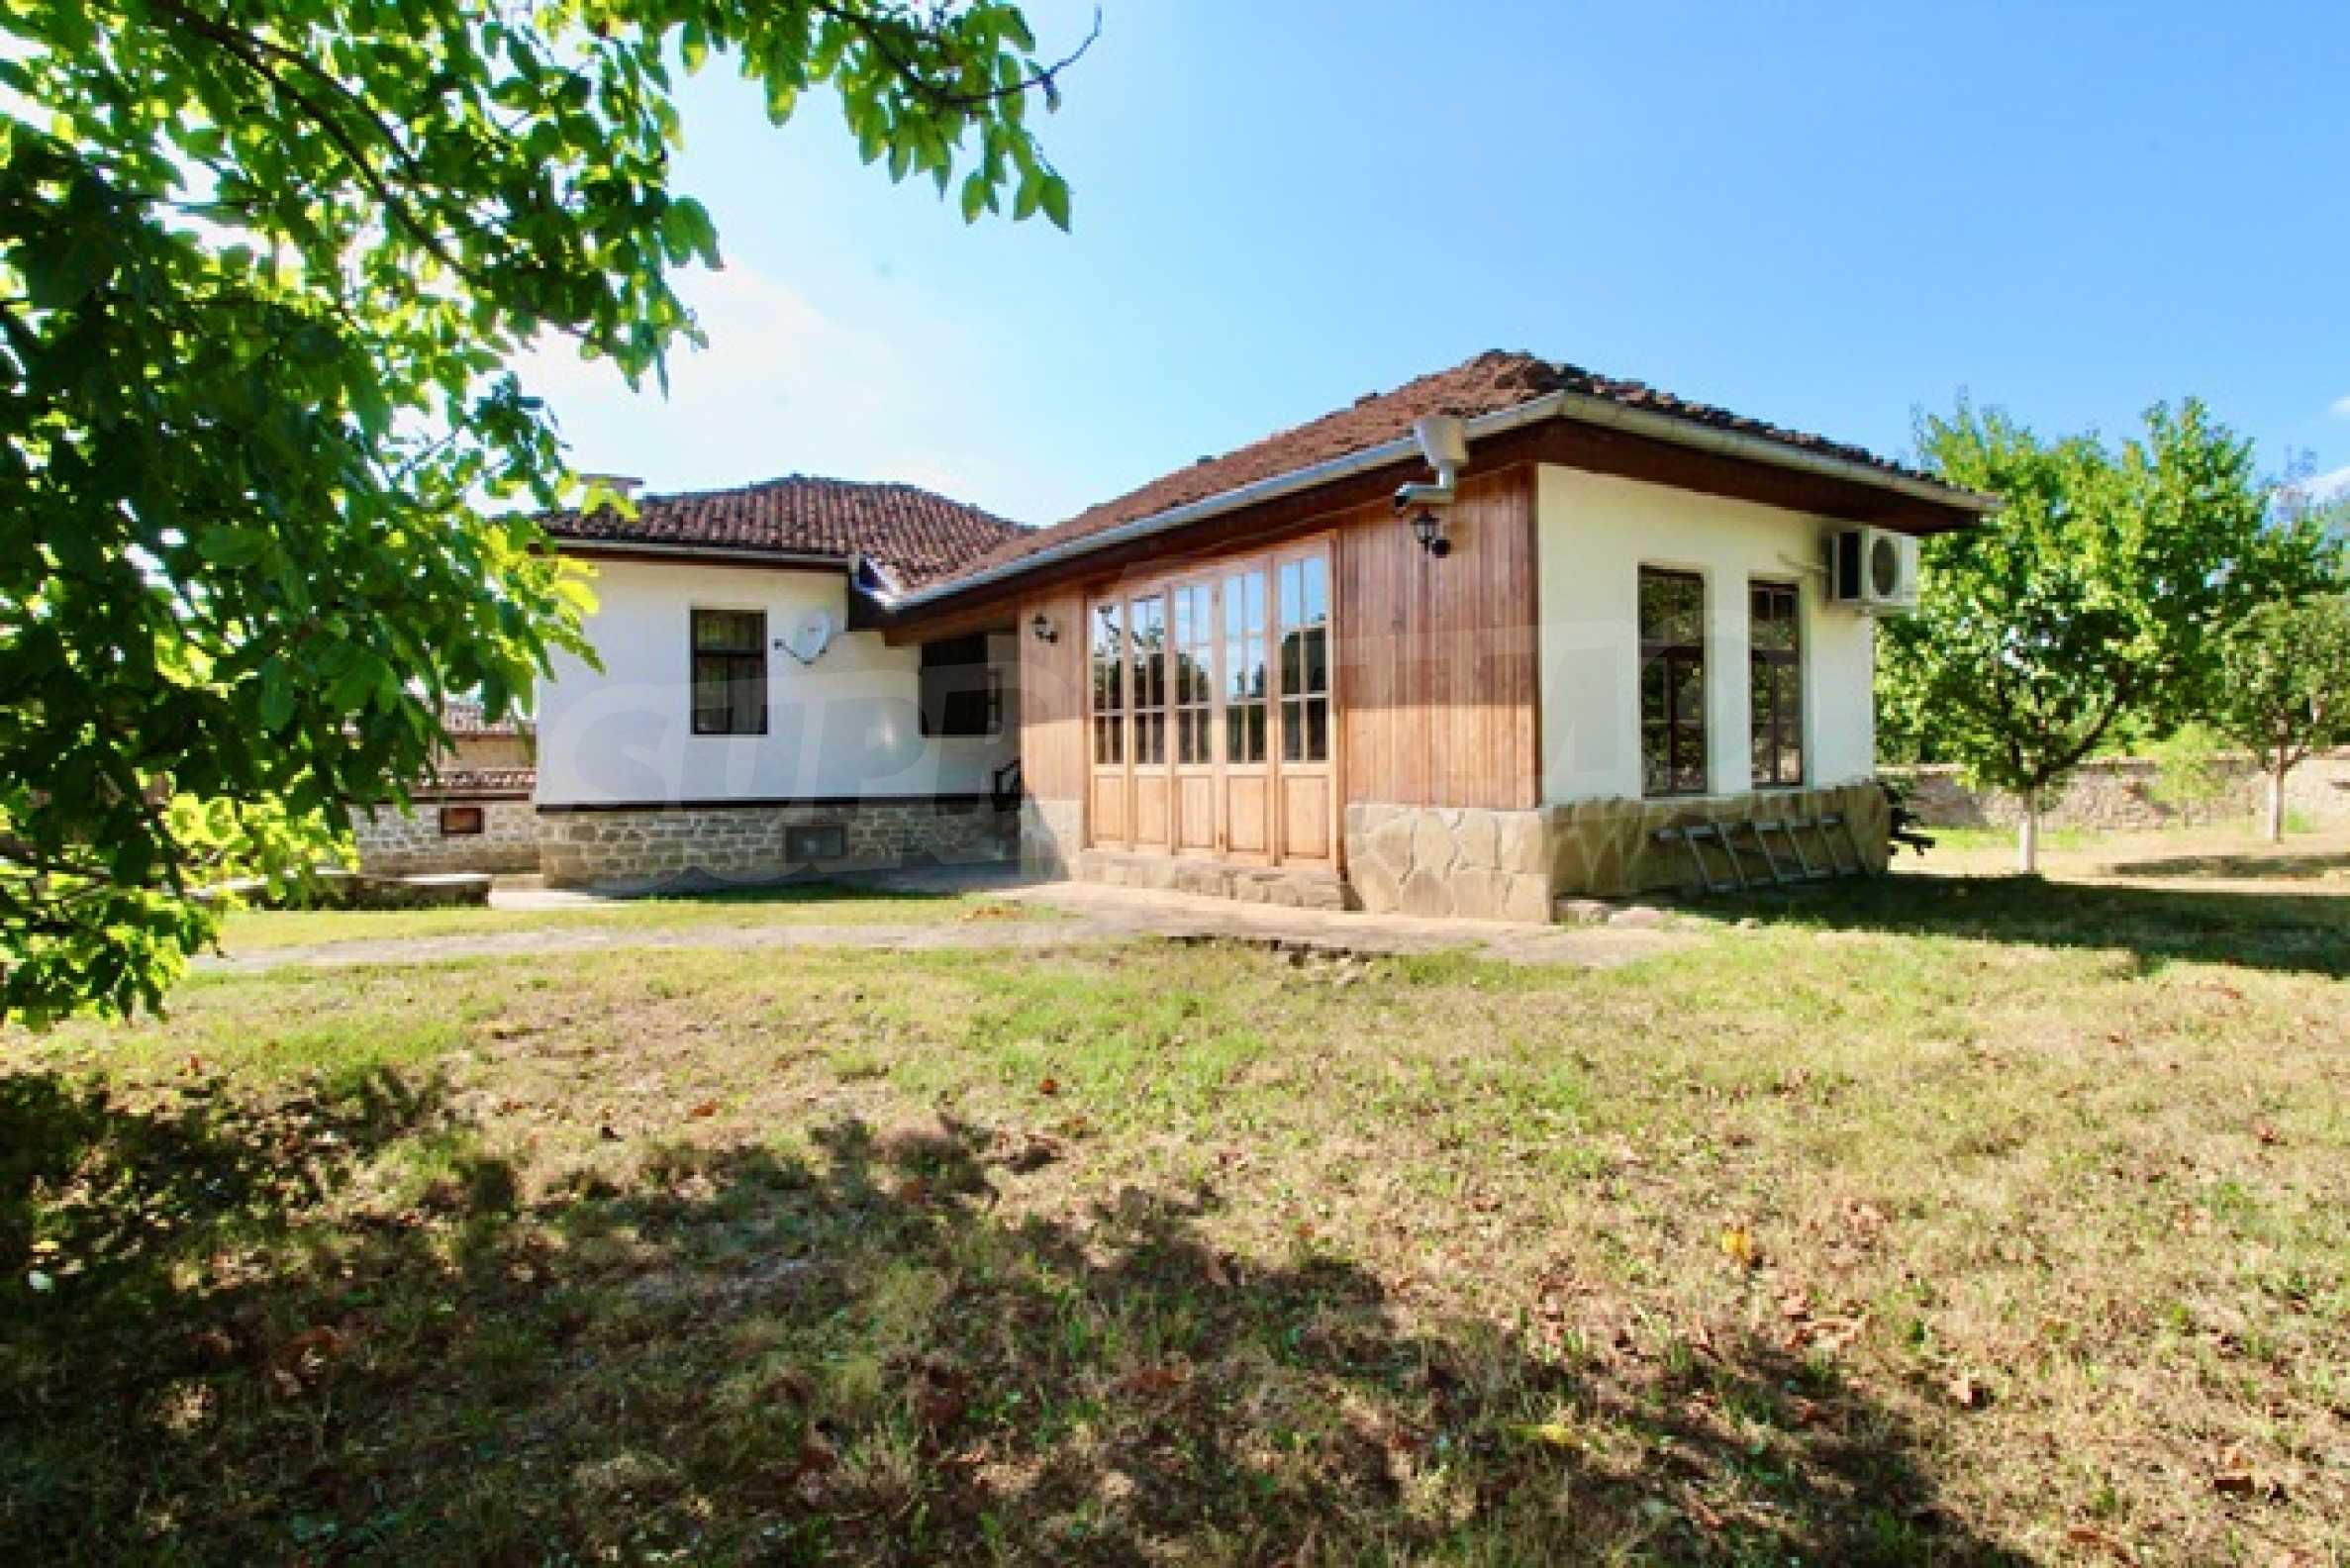 Lovely old house just 17 km away from Veliko Tarnovo 24